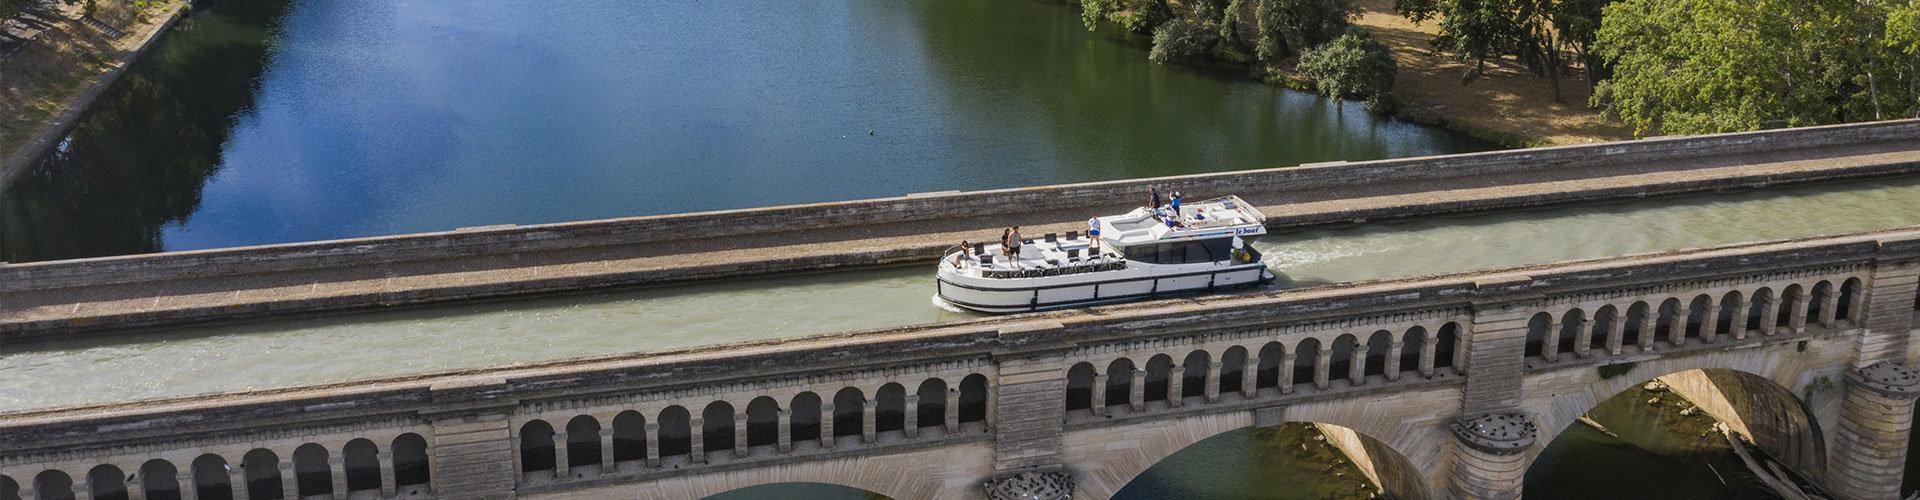 Hausbootferien 2021 mit Le Boat